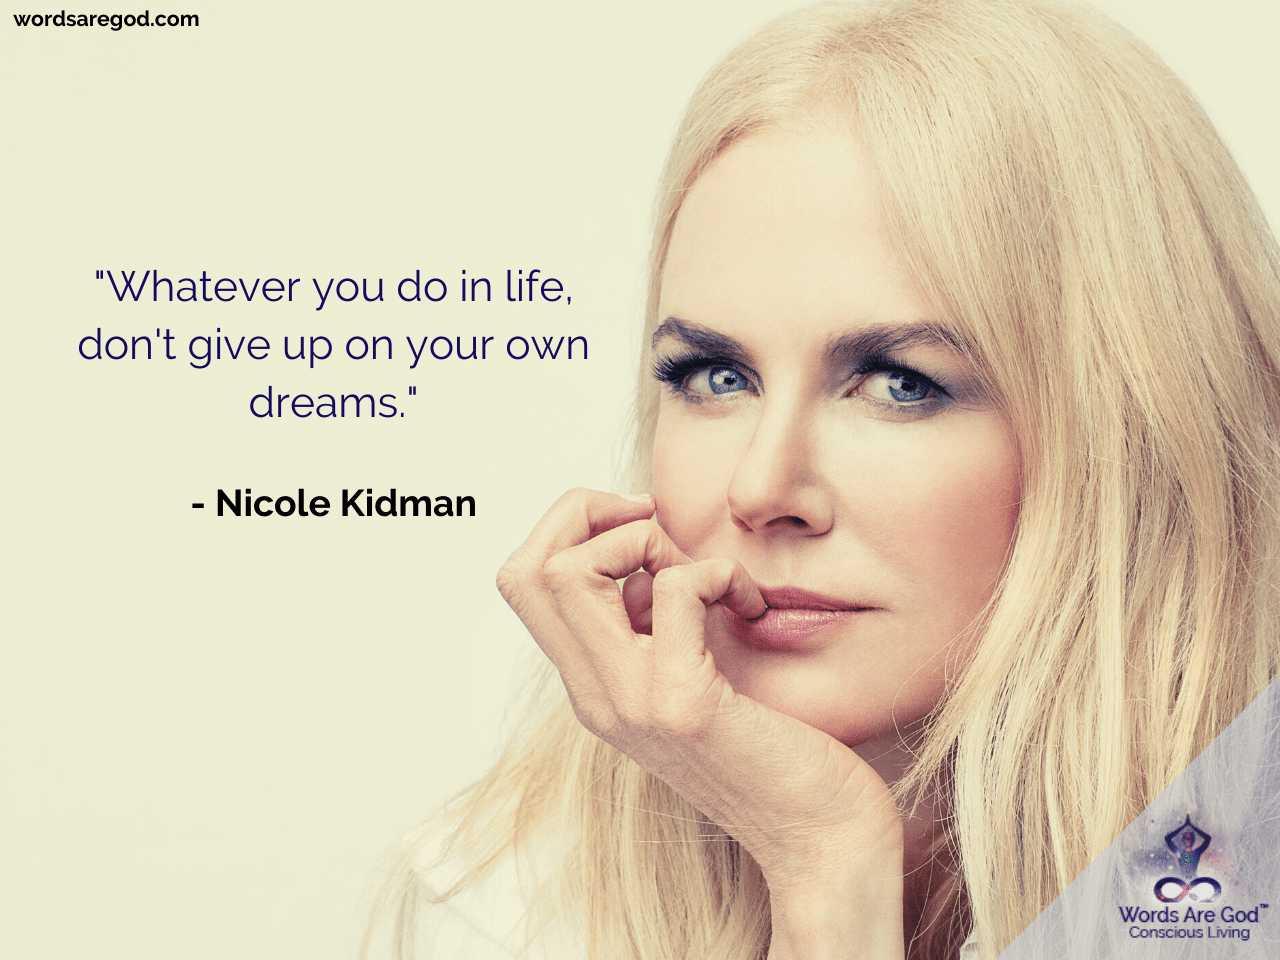 Nicole Kidman Life Quote